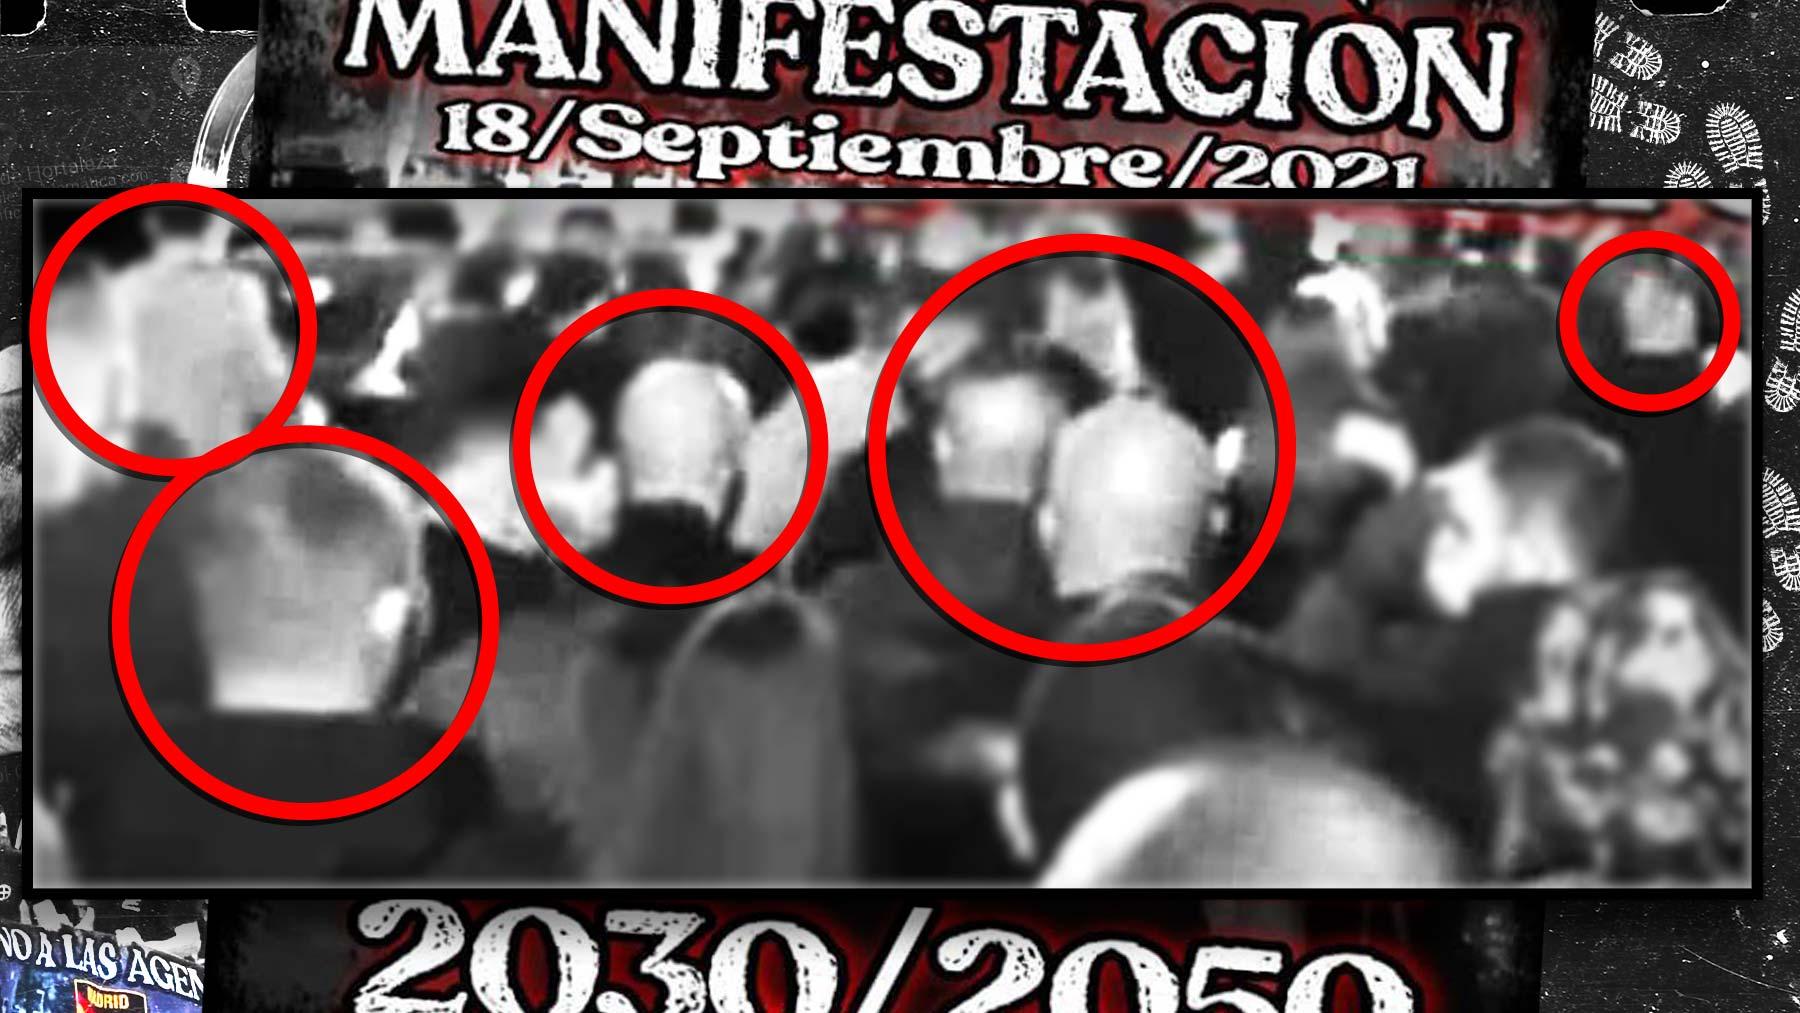 El detalle del cartel con estética neonazi de la marcha de Chueca.